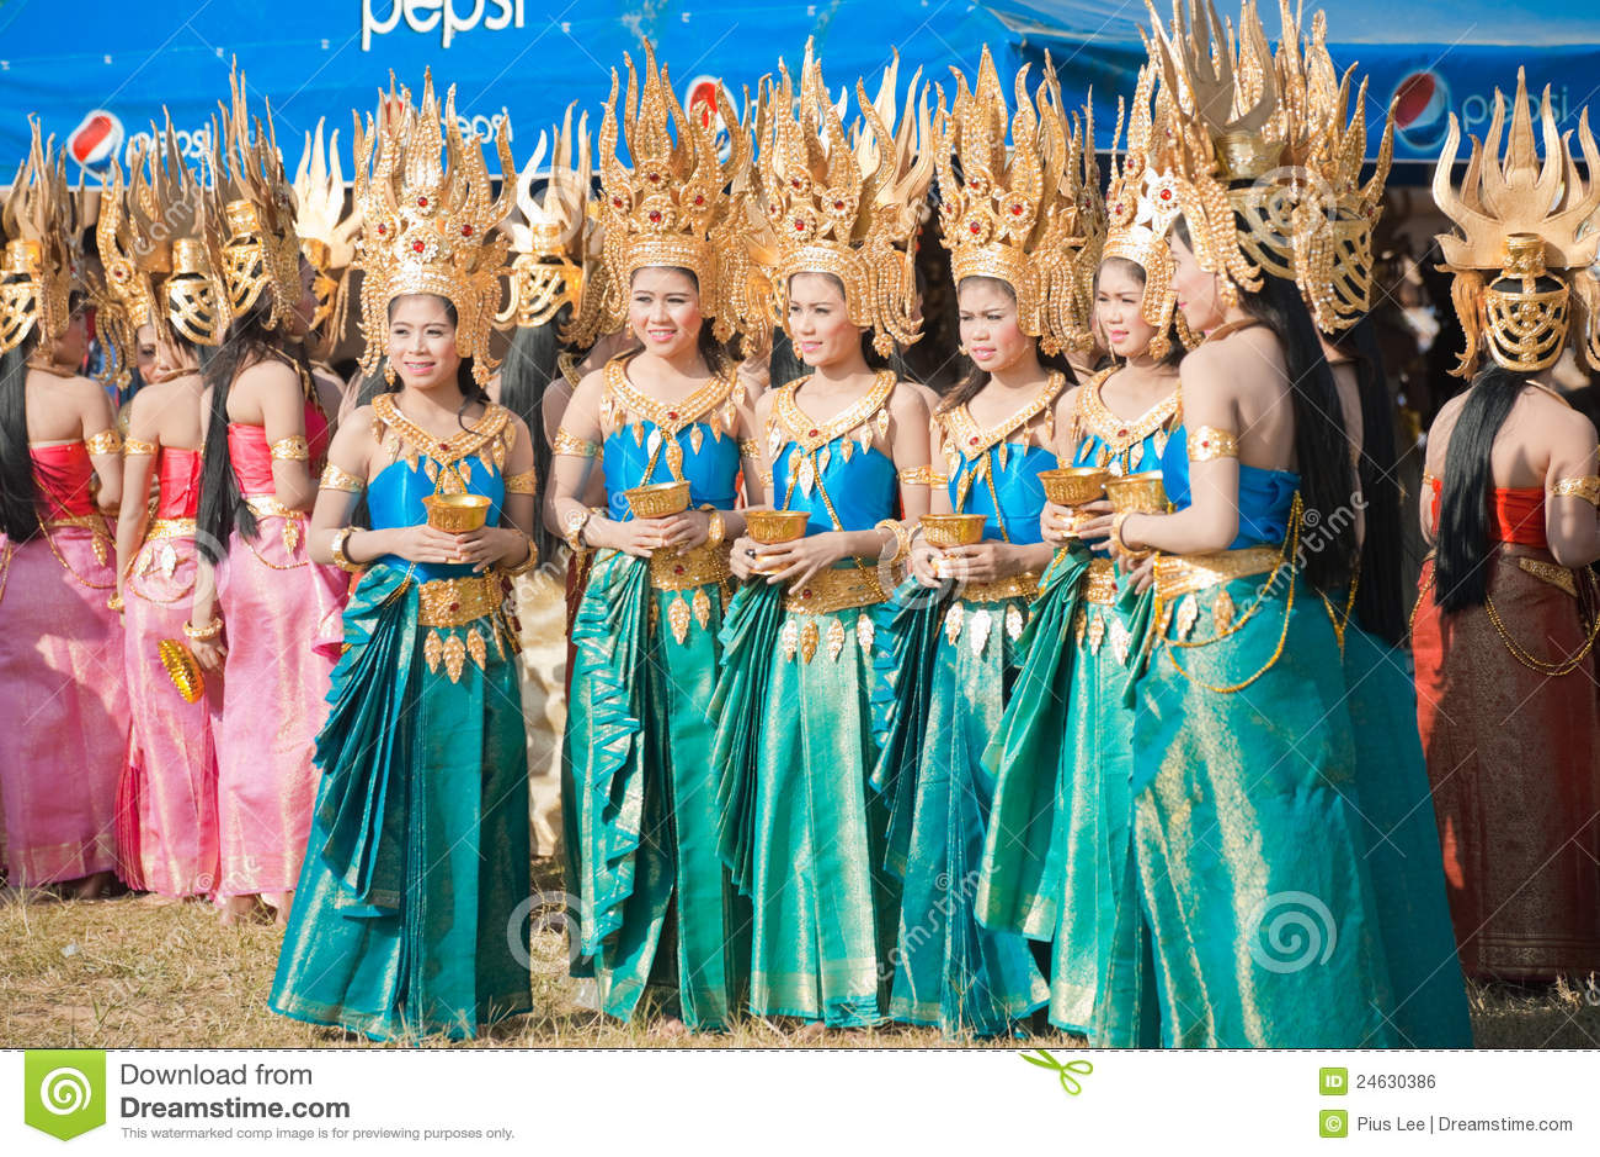 Surin Thailand  city photos gallery : SURIN, ISAN, THAILAND NOVEMBER 20, 2010: Beautifully dressed Thai ...